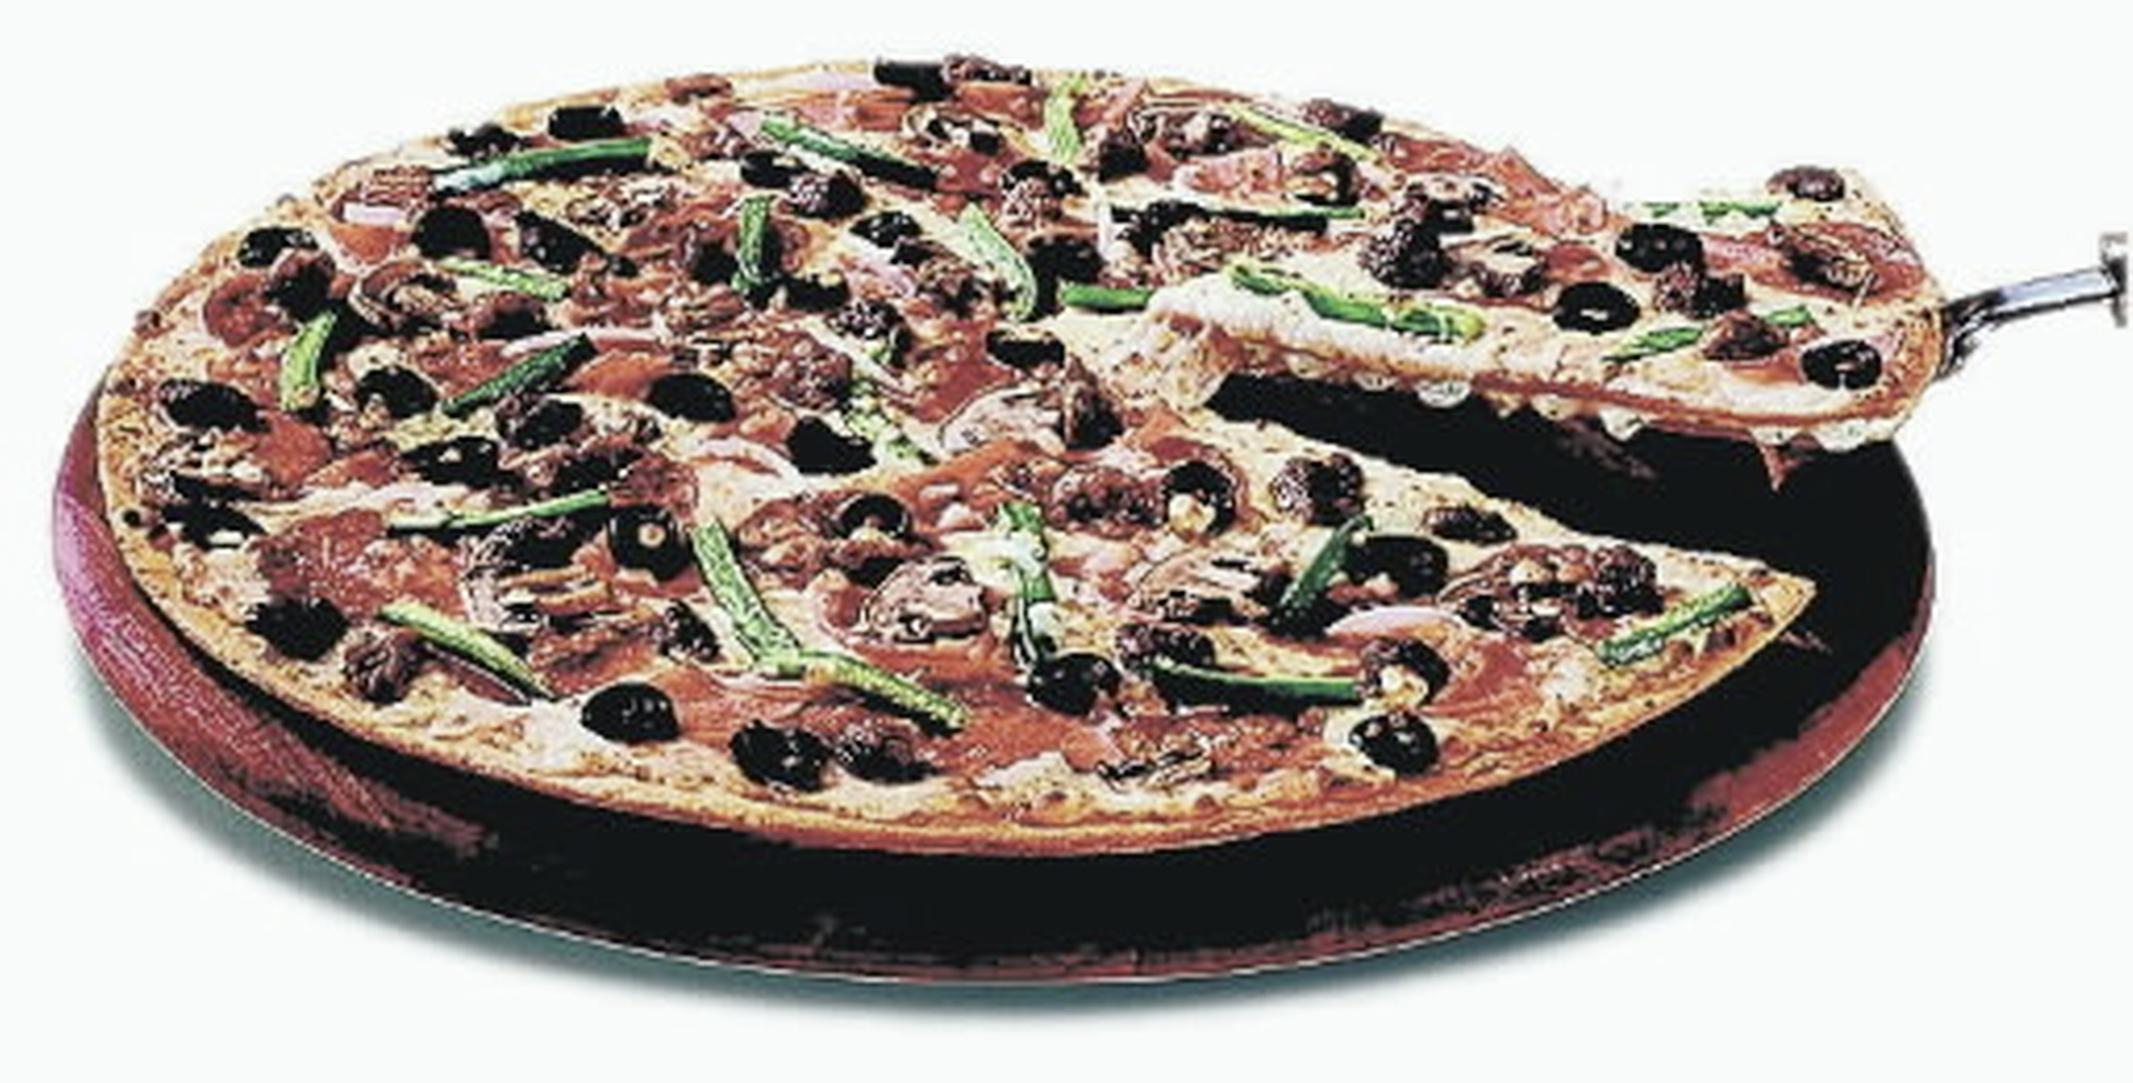 Domino's Pizza start zaak op Raadhuisplein in Hoogkarspel in ruimte die al vijf jaar leeg staat